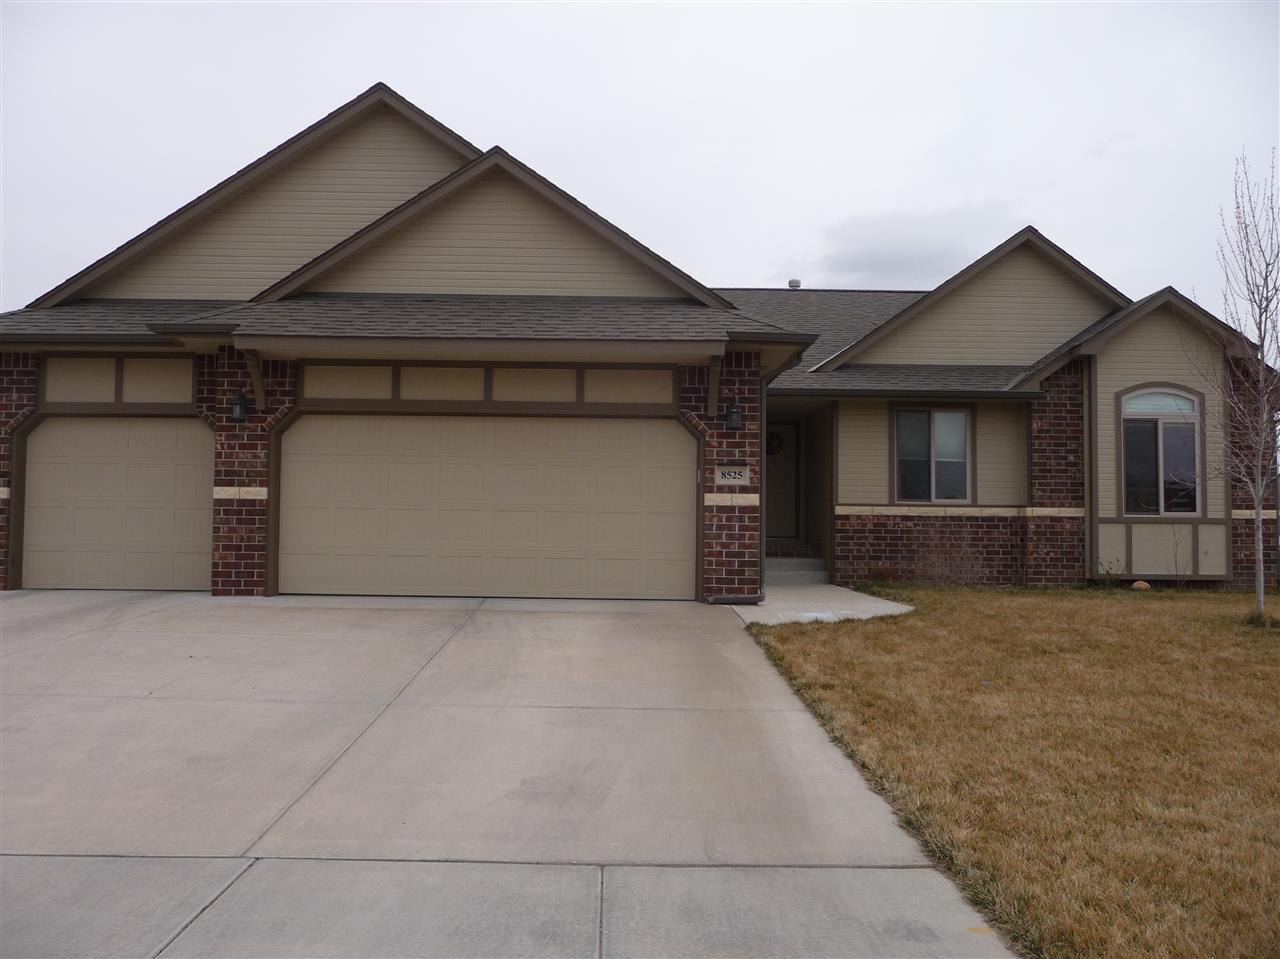 8525 W Candlewood Ct, Wichita, KS 67205